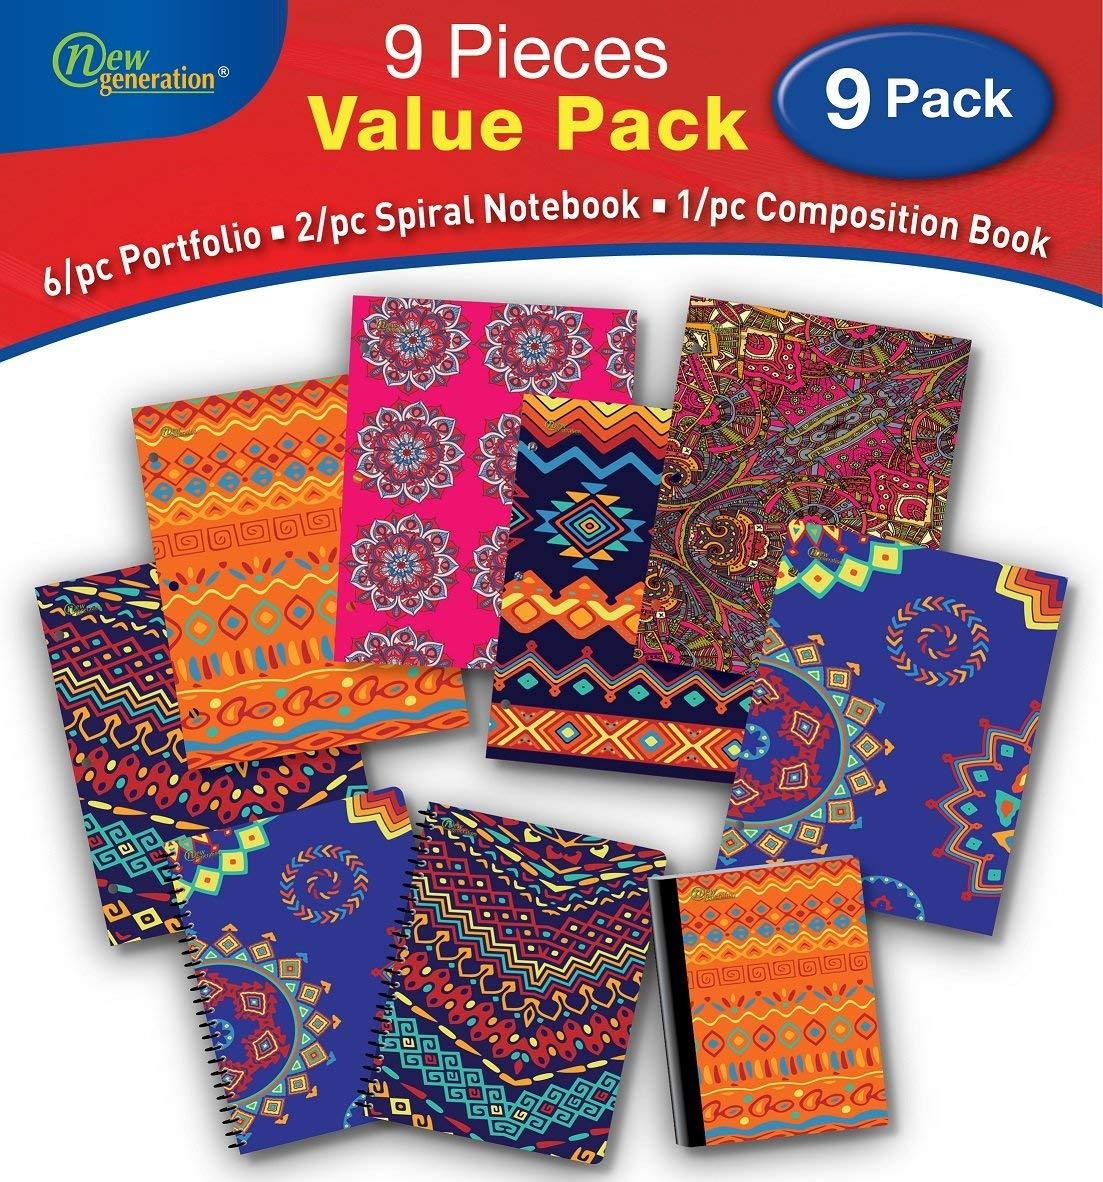 New Generation - Ethnic - 9/PC Bundle Value Pack contain, 6/pc Folders, 2/pc Spiral Notebooks,1/pc Composition Book - 9/pcs Bundle set, (WIDE Ruled 9 PIECE VALUE PACK)